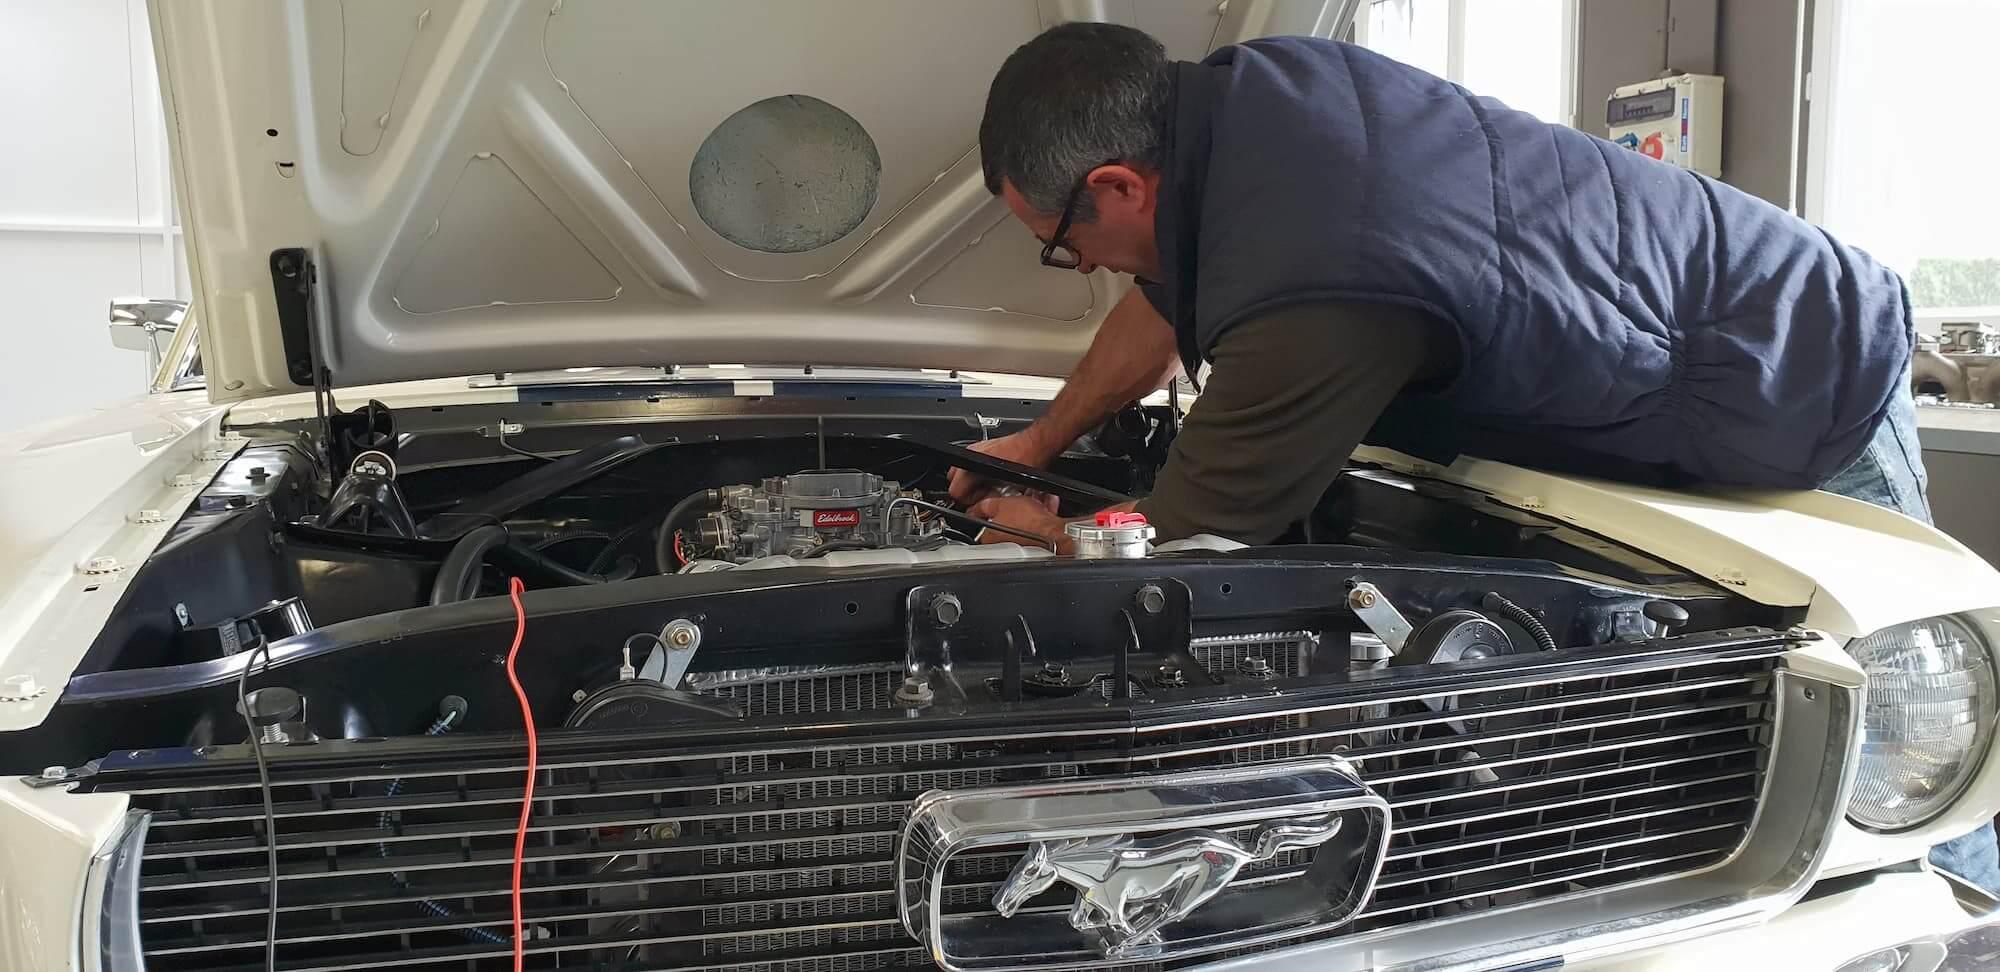 Garage des Damiers - Restauration voiture ancienne - Ford mustang